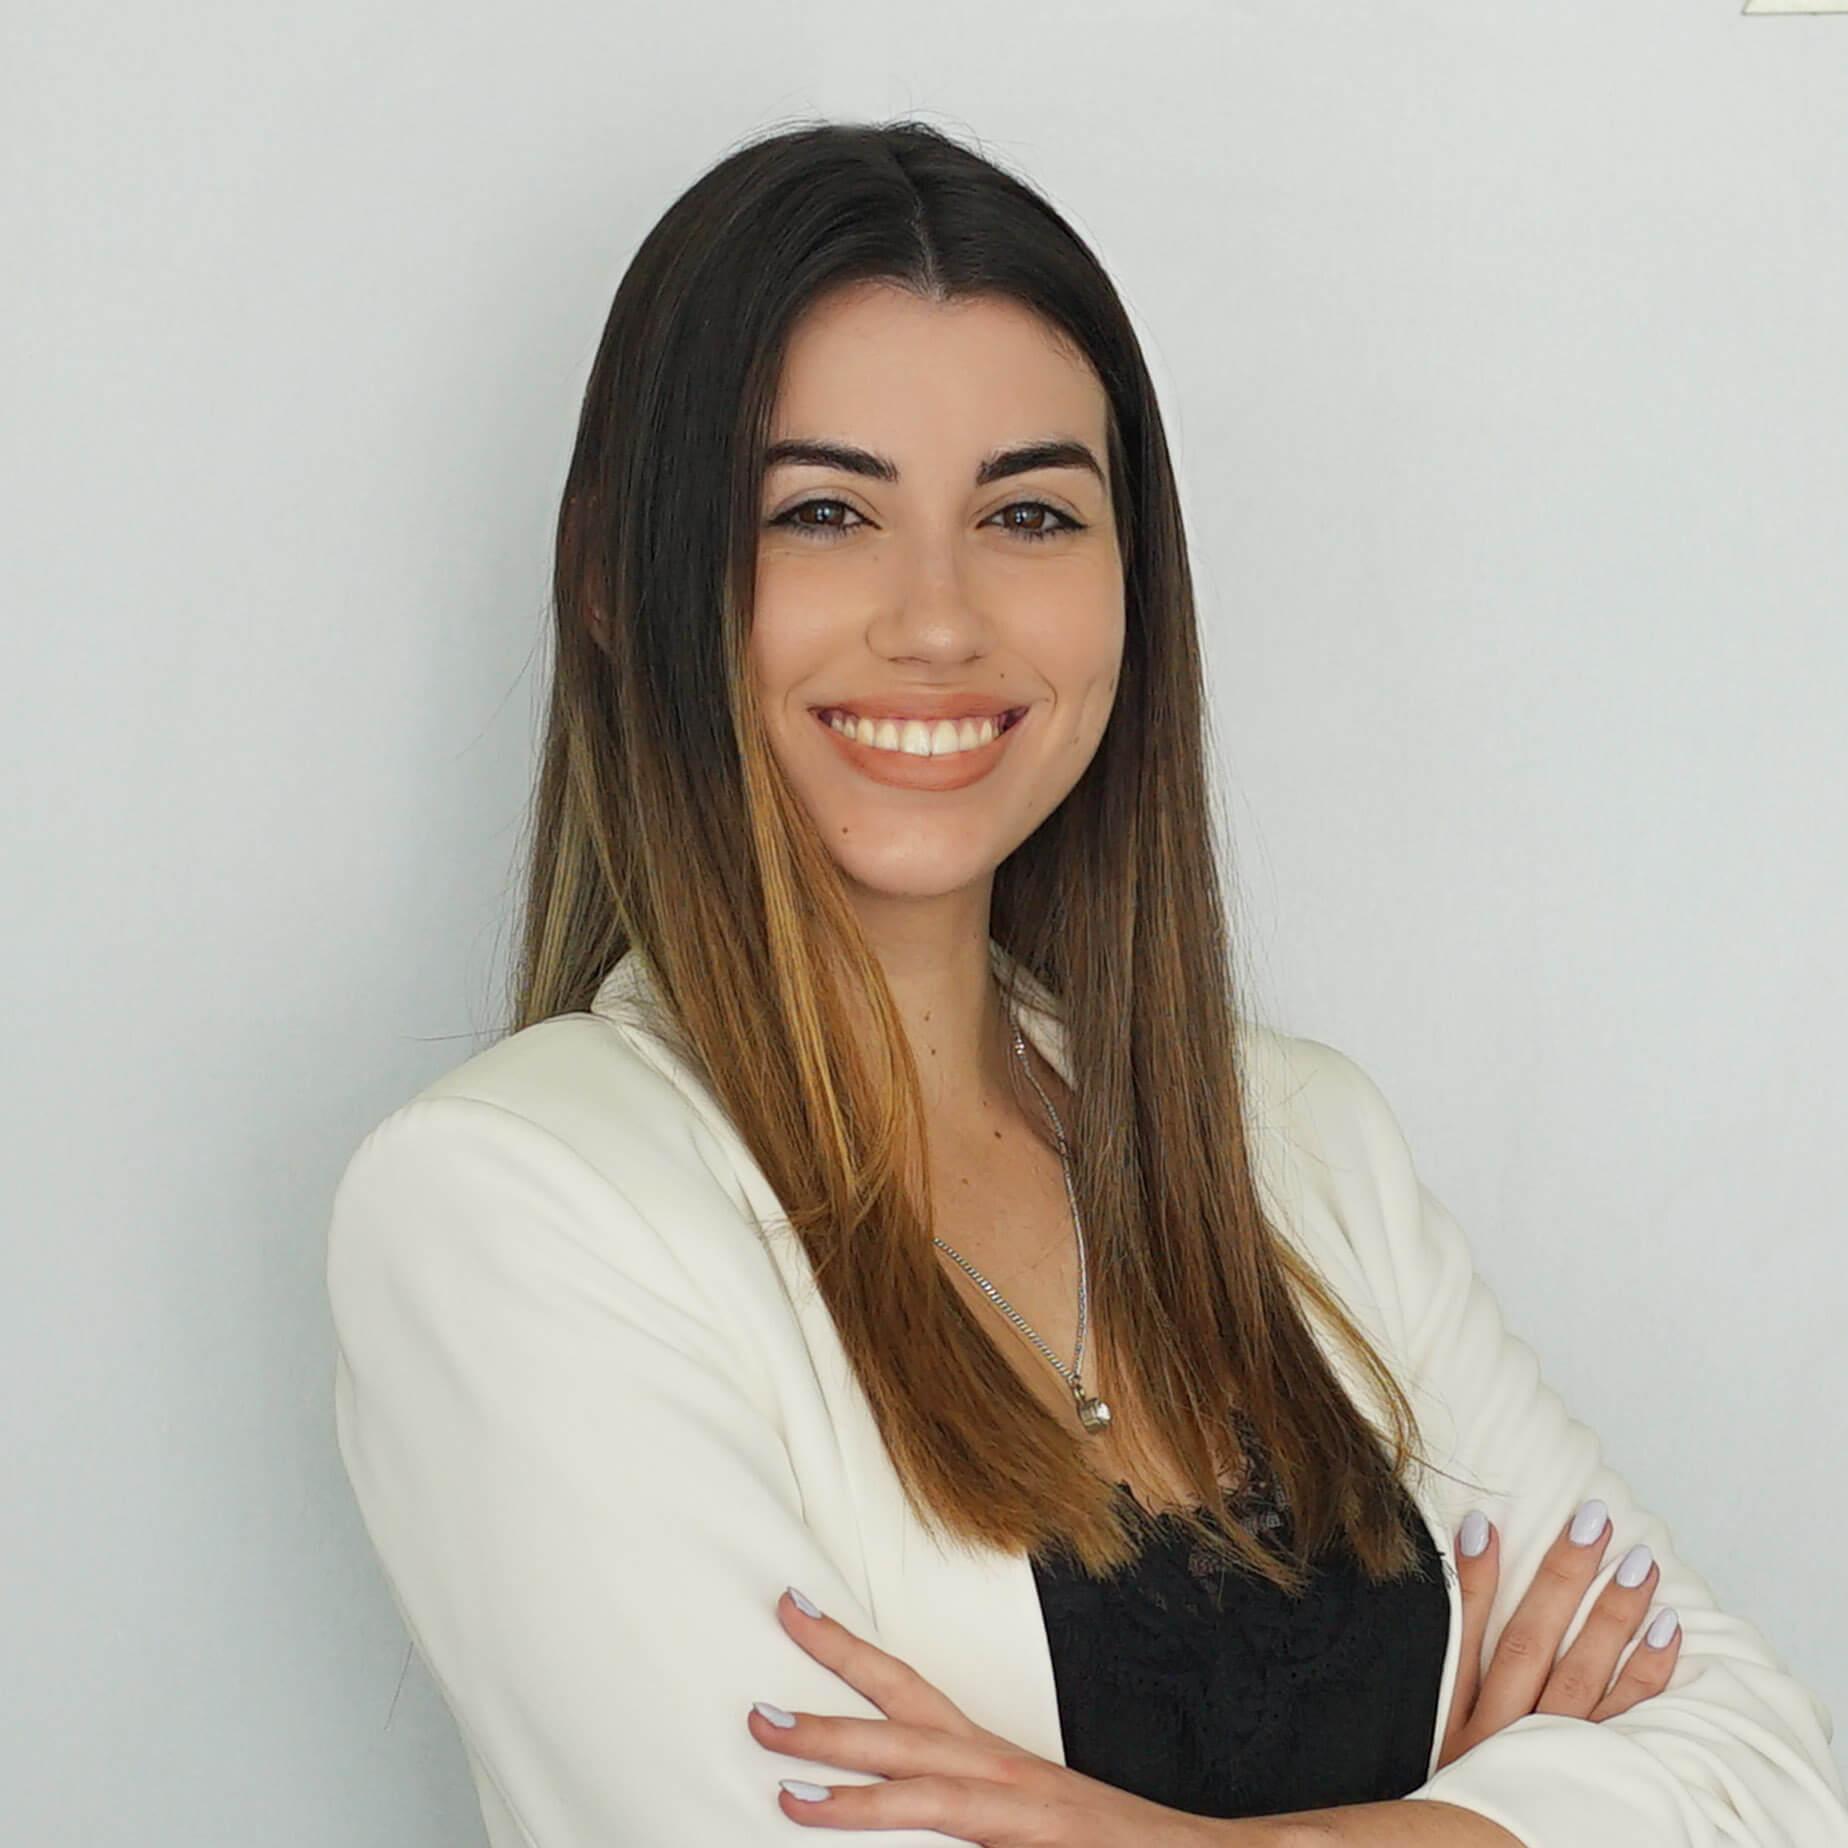 Bárbara Almeida - Talent Acquisition @ IT People Innovation